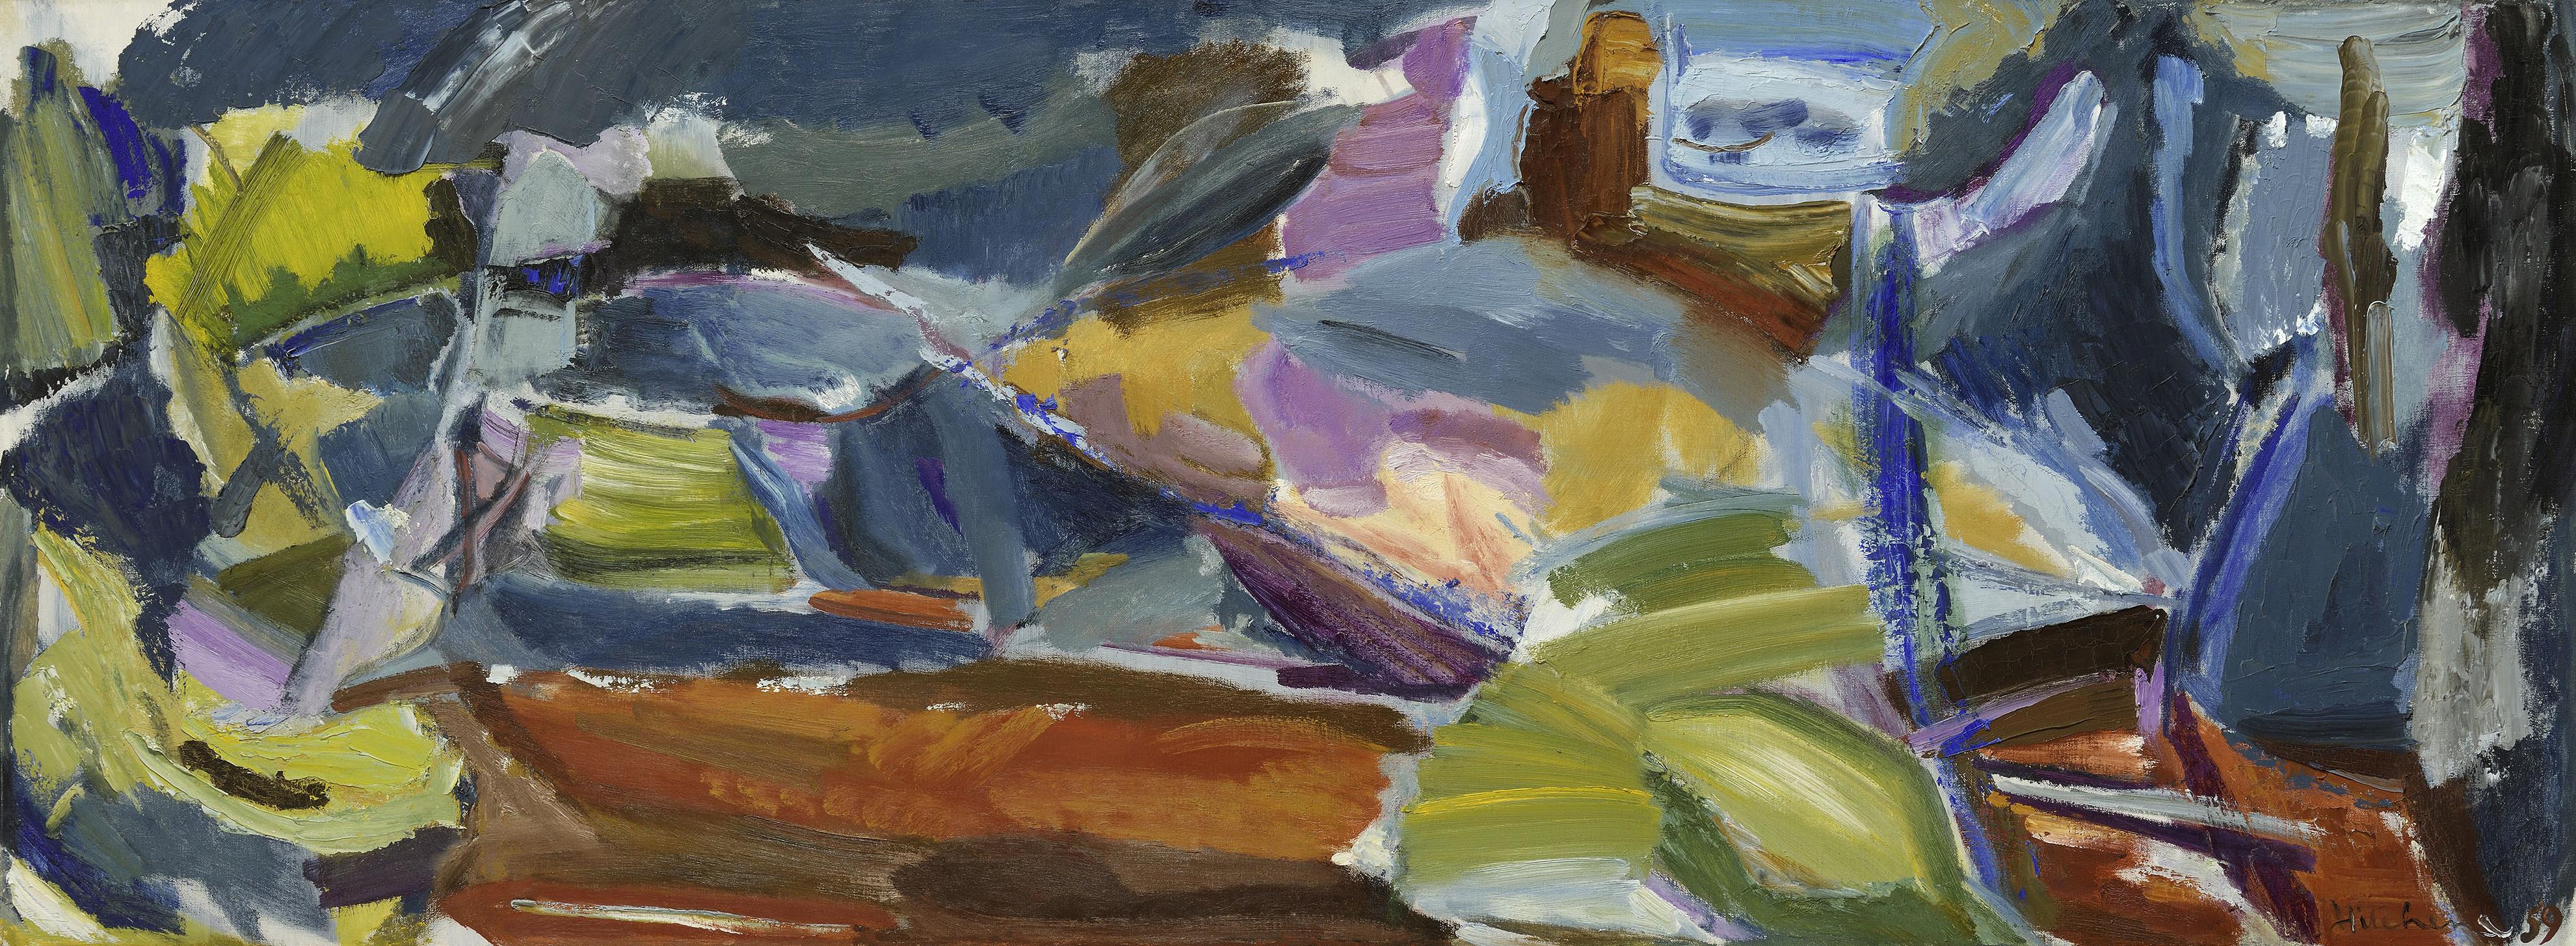 Ivon Hitchens 1893-1979 Larchwood Path Variation 1962 Oil on canvas 15 x 82 in / 38 x 210 cm